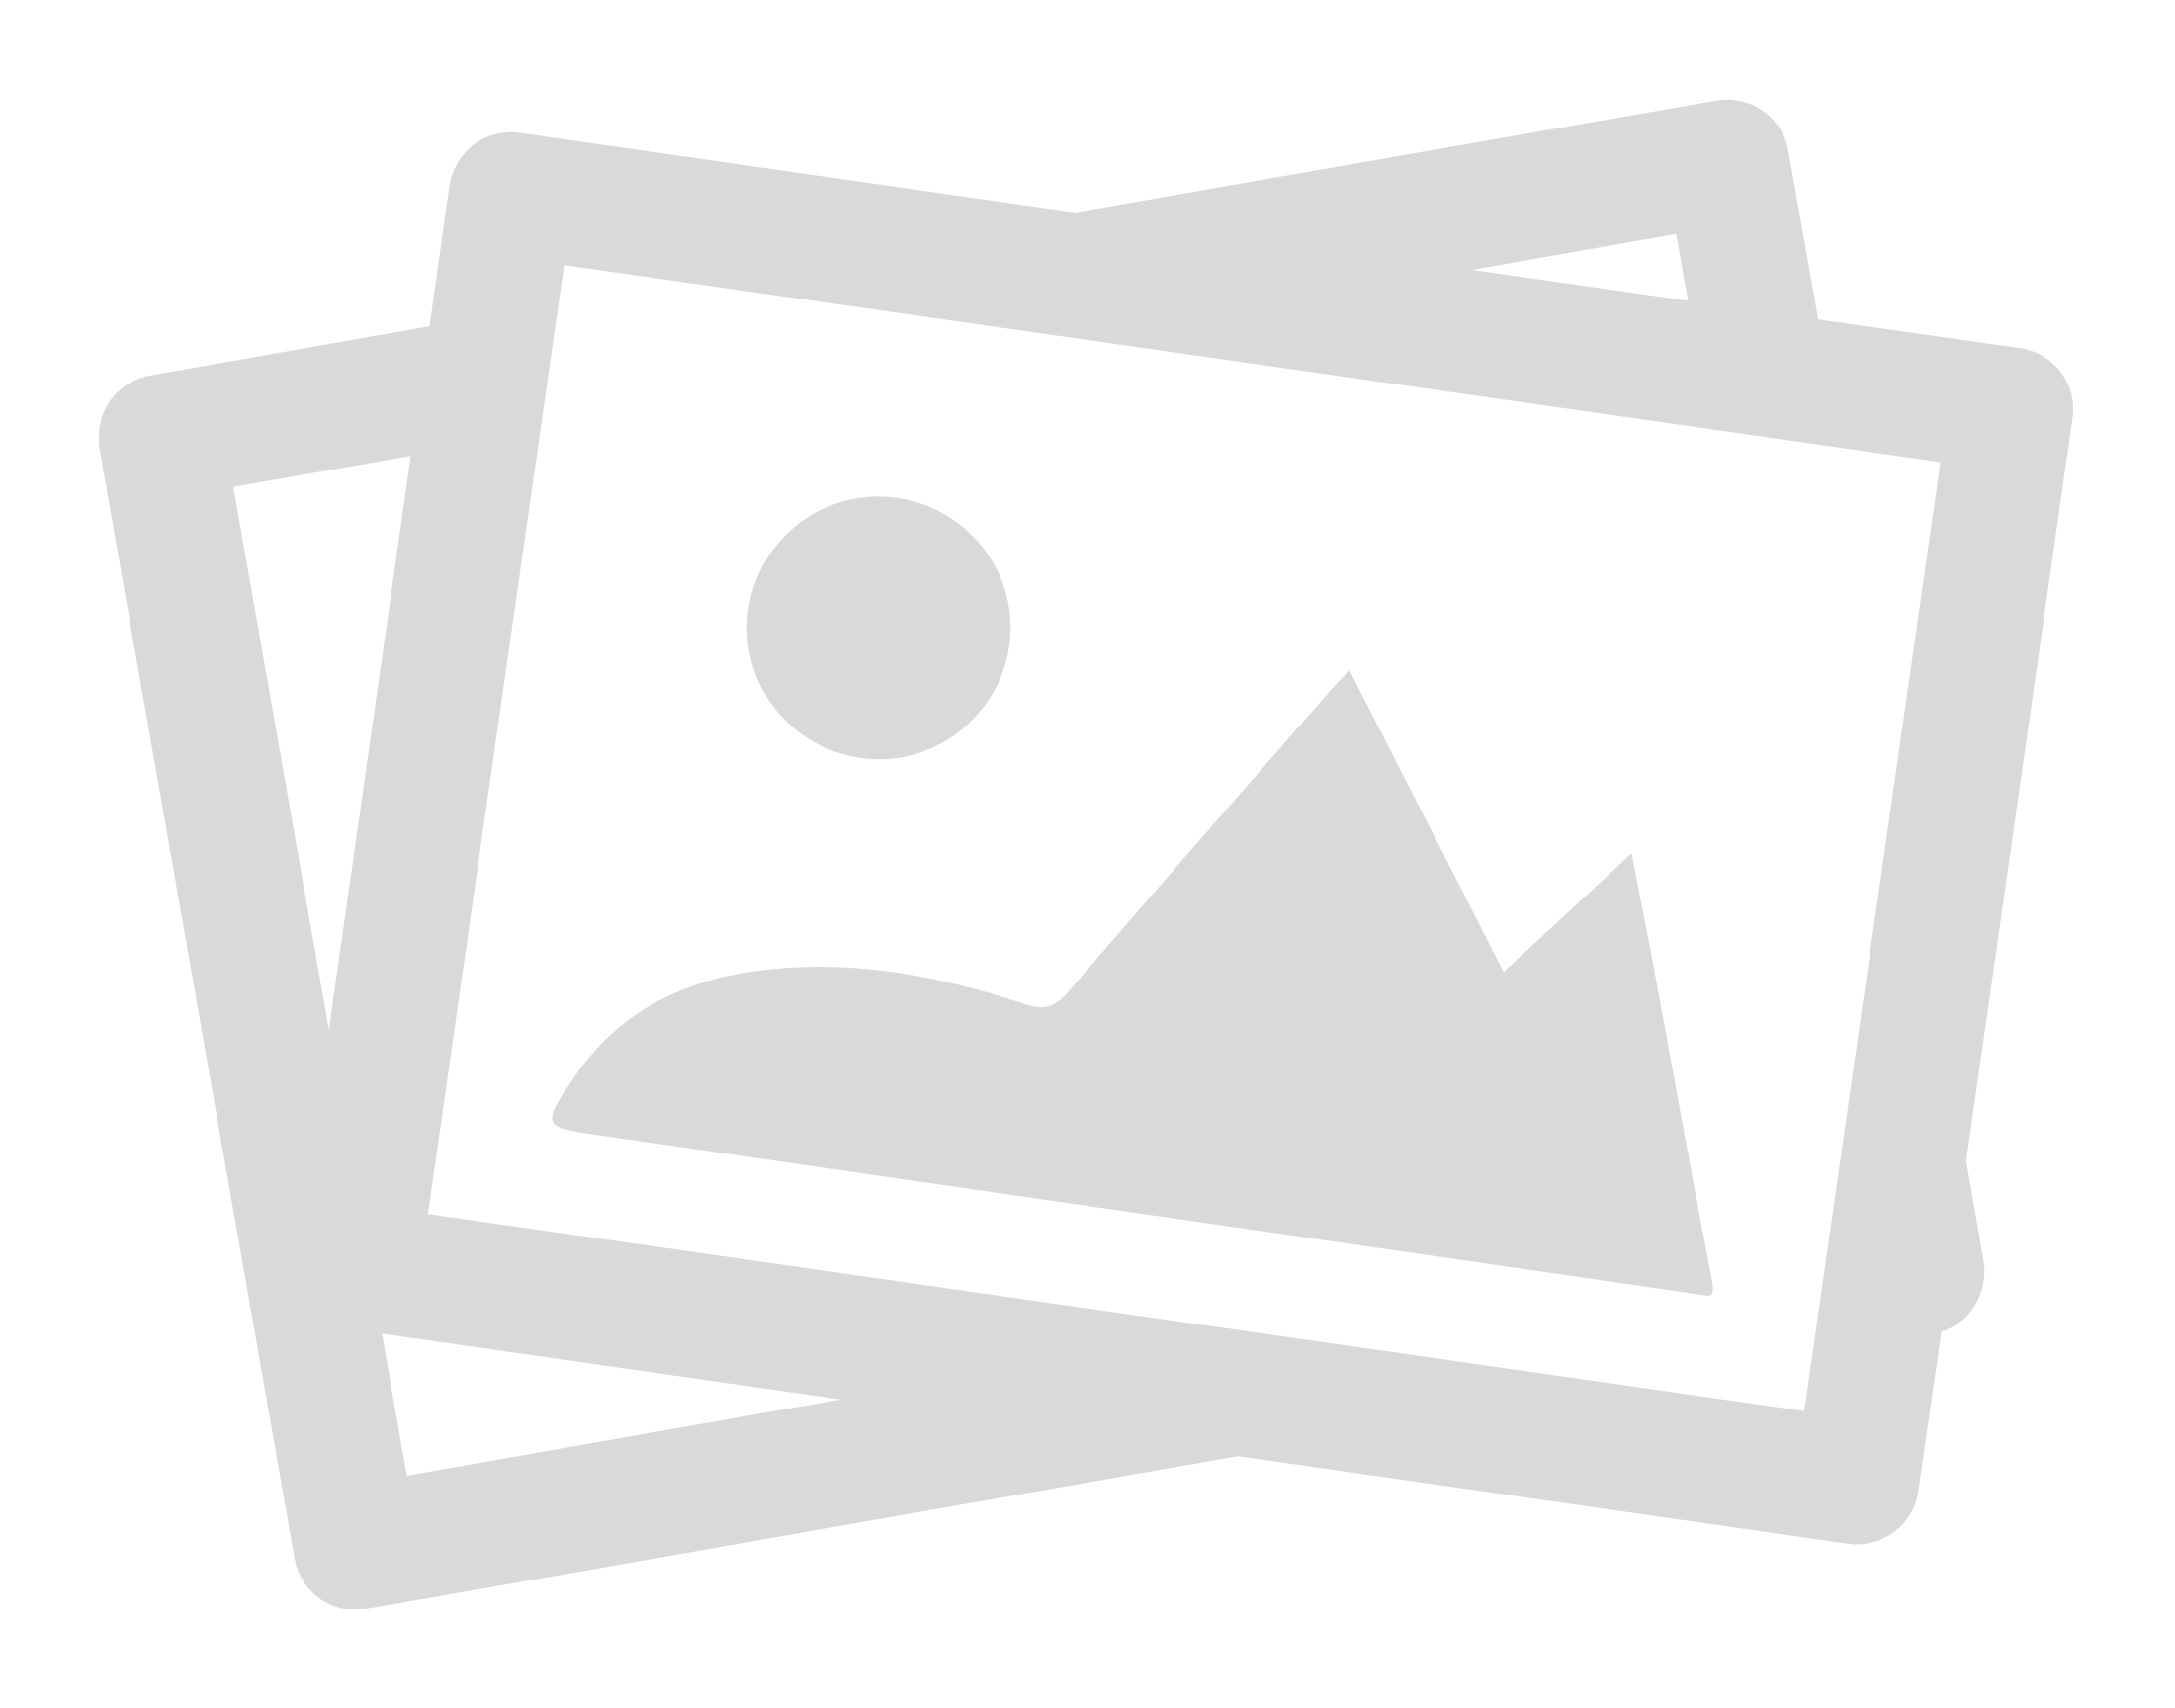 50 shades of grey movie online free